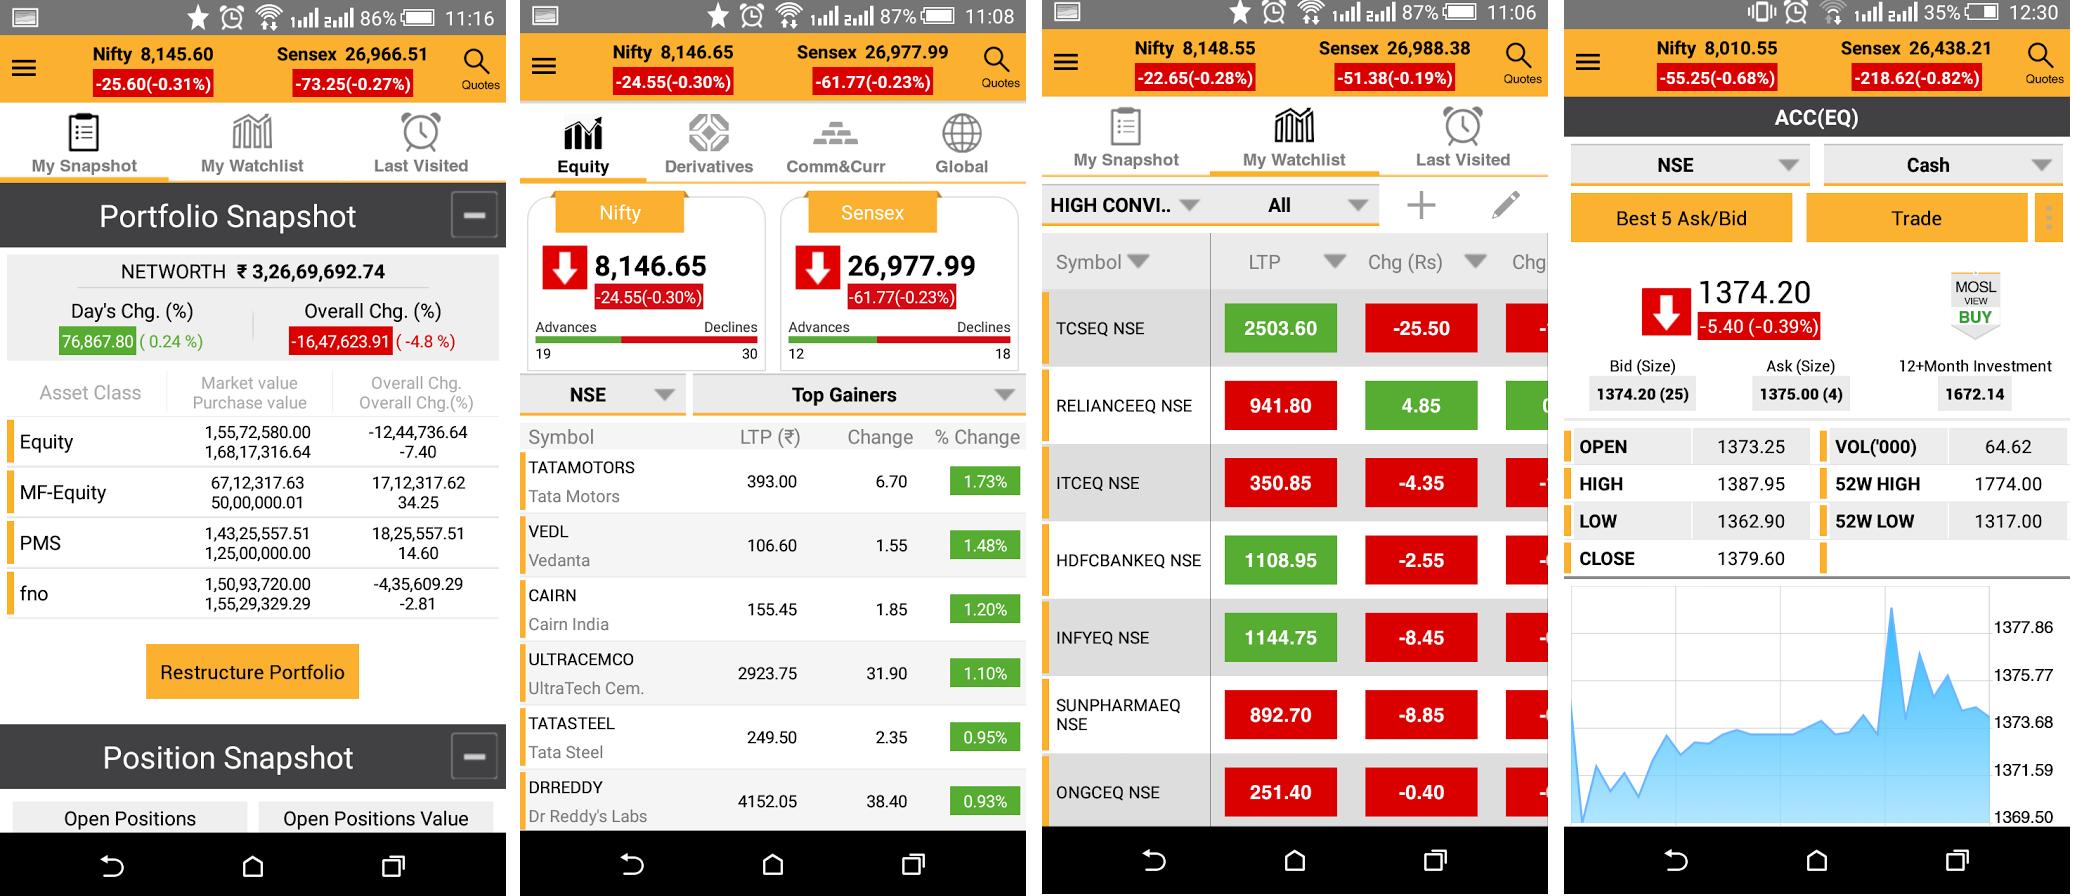 motilal-oswal-mobile-trading-app-screenshot